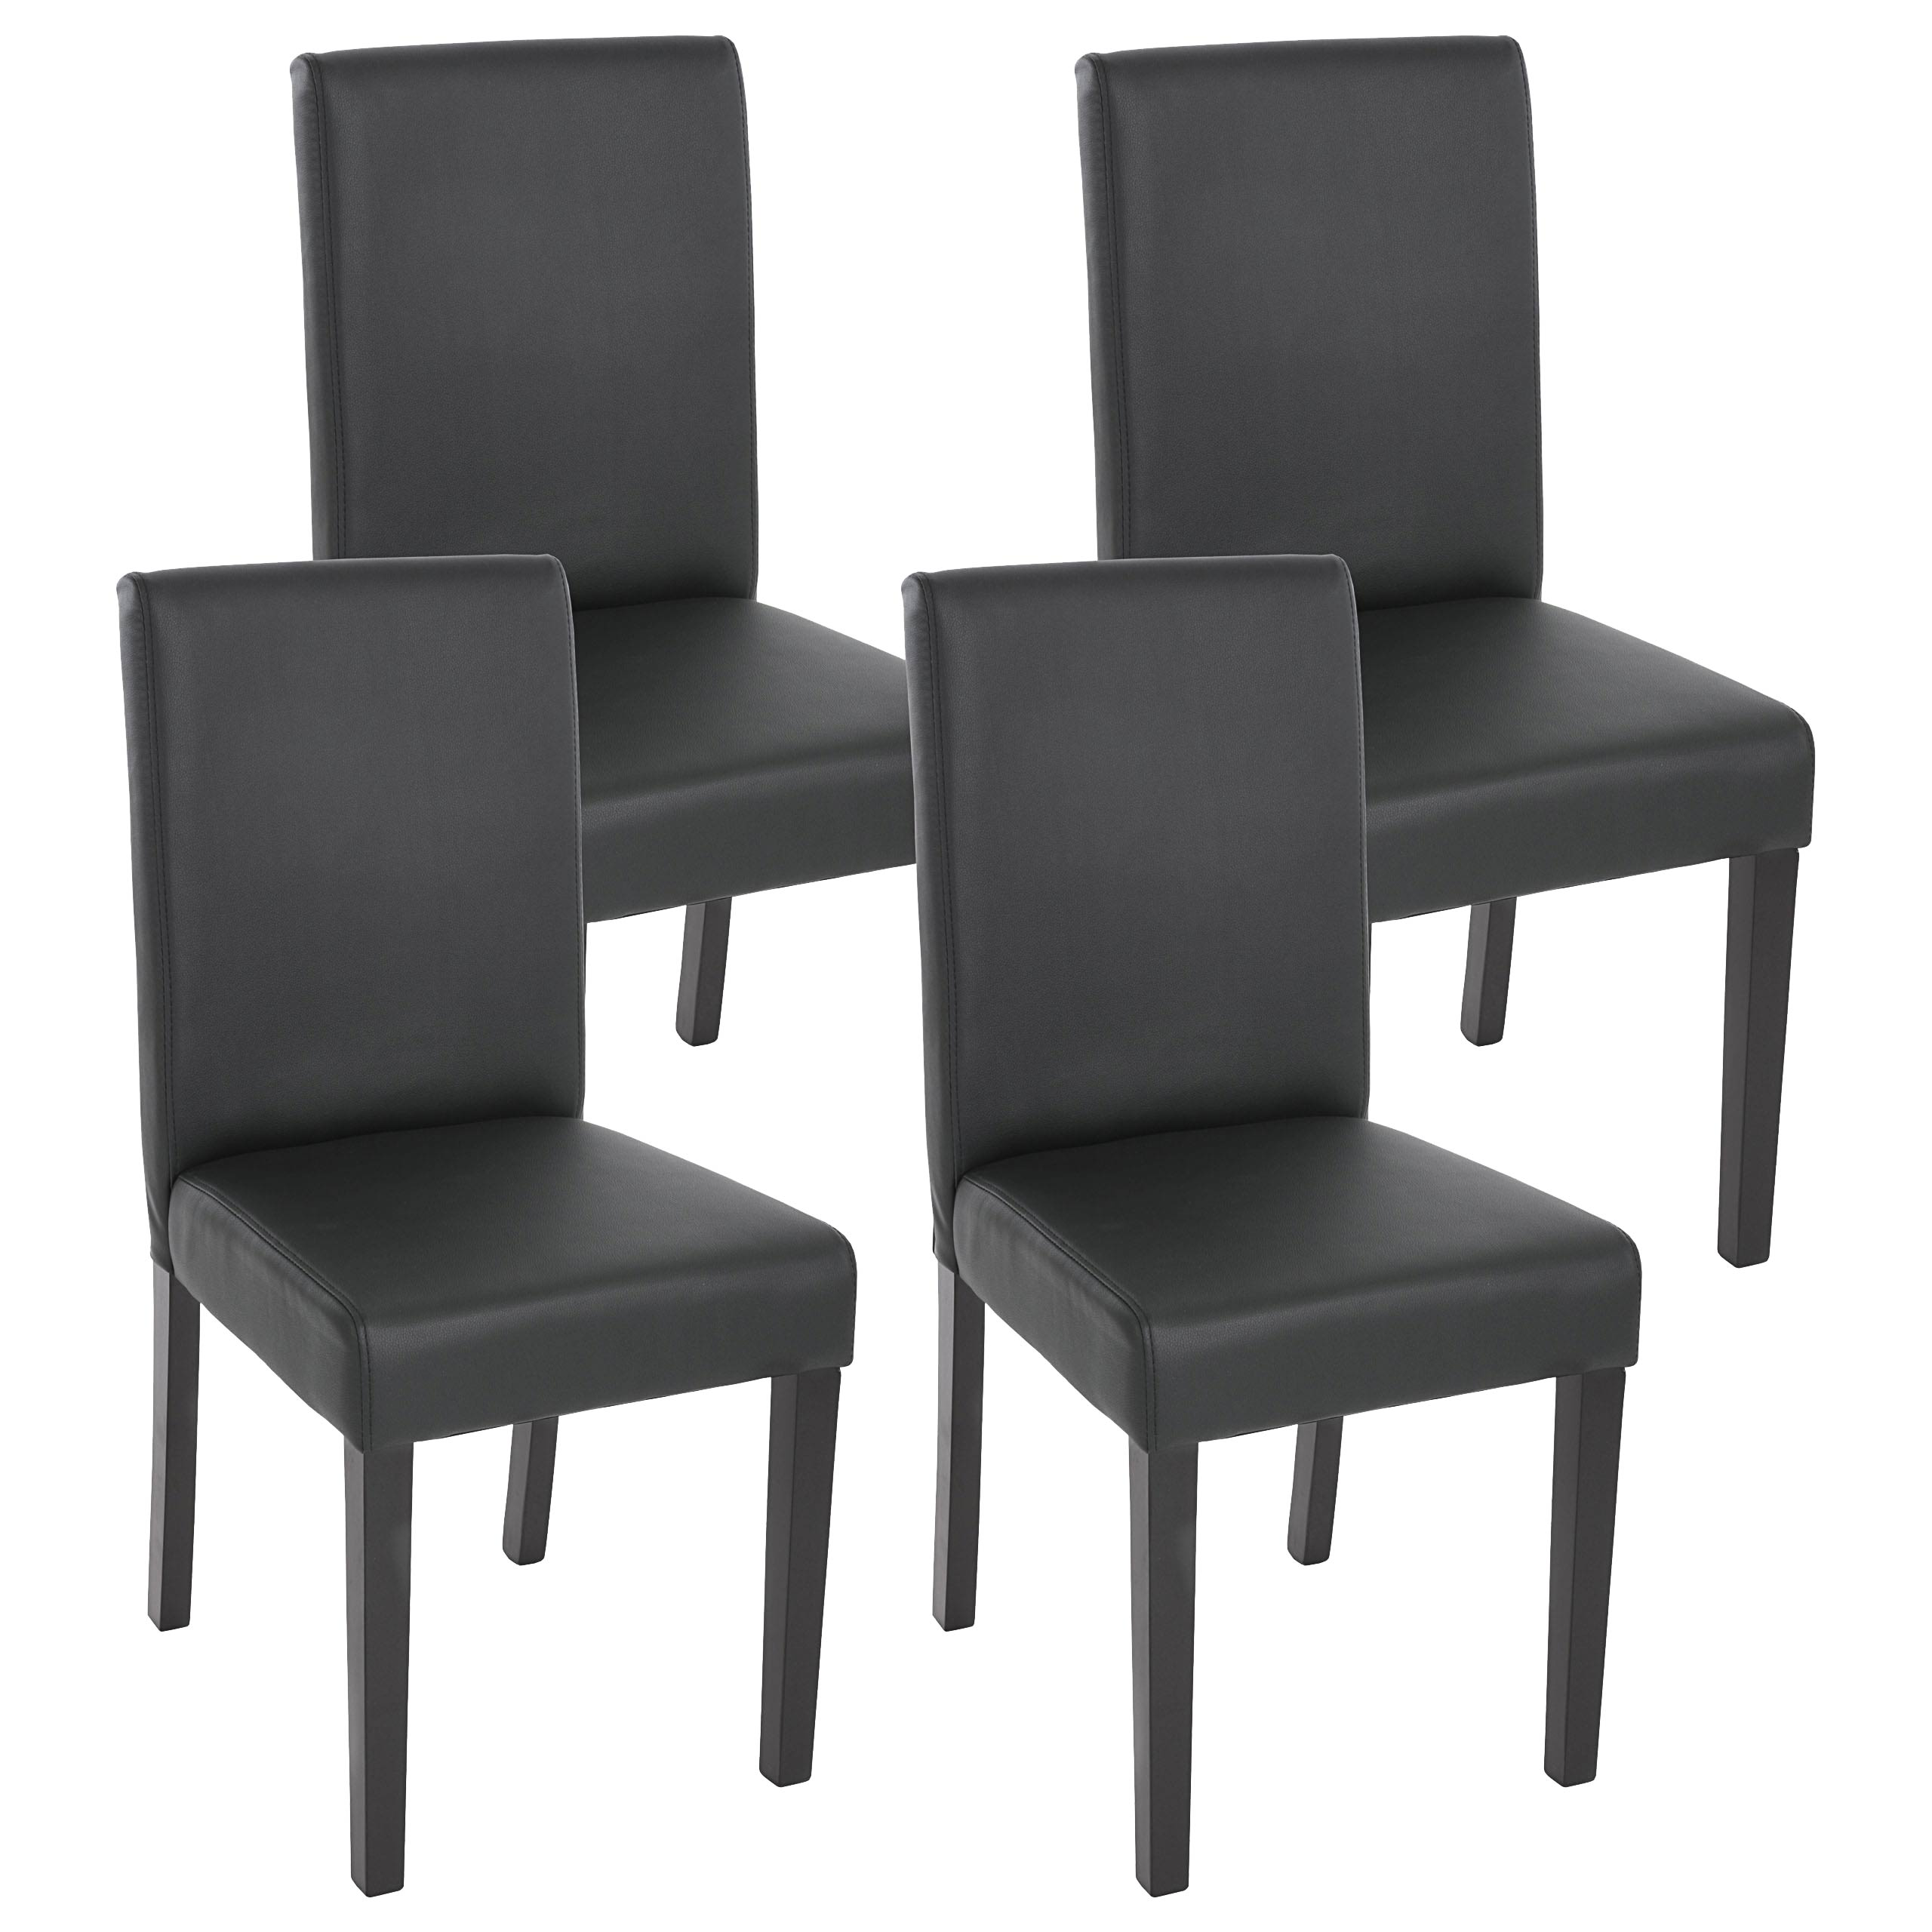 rot-braun 4x Esszimmerstuhl Stuhl Lehnstuhl Littau Kunstleder dunkle Beine